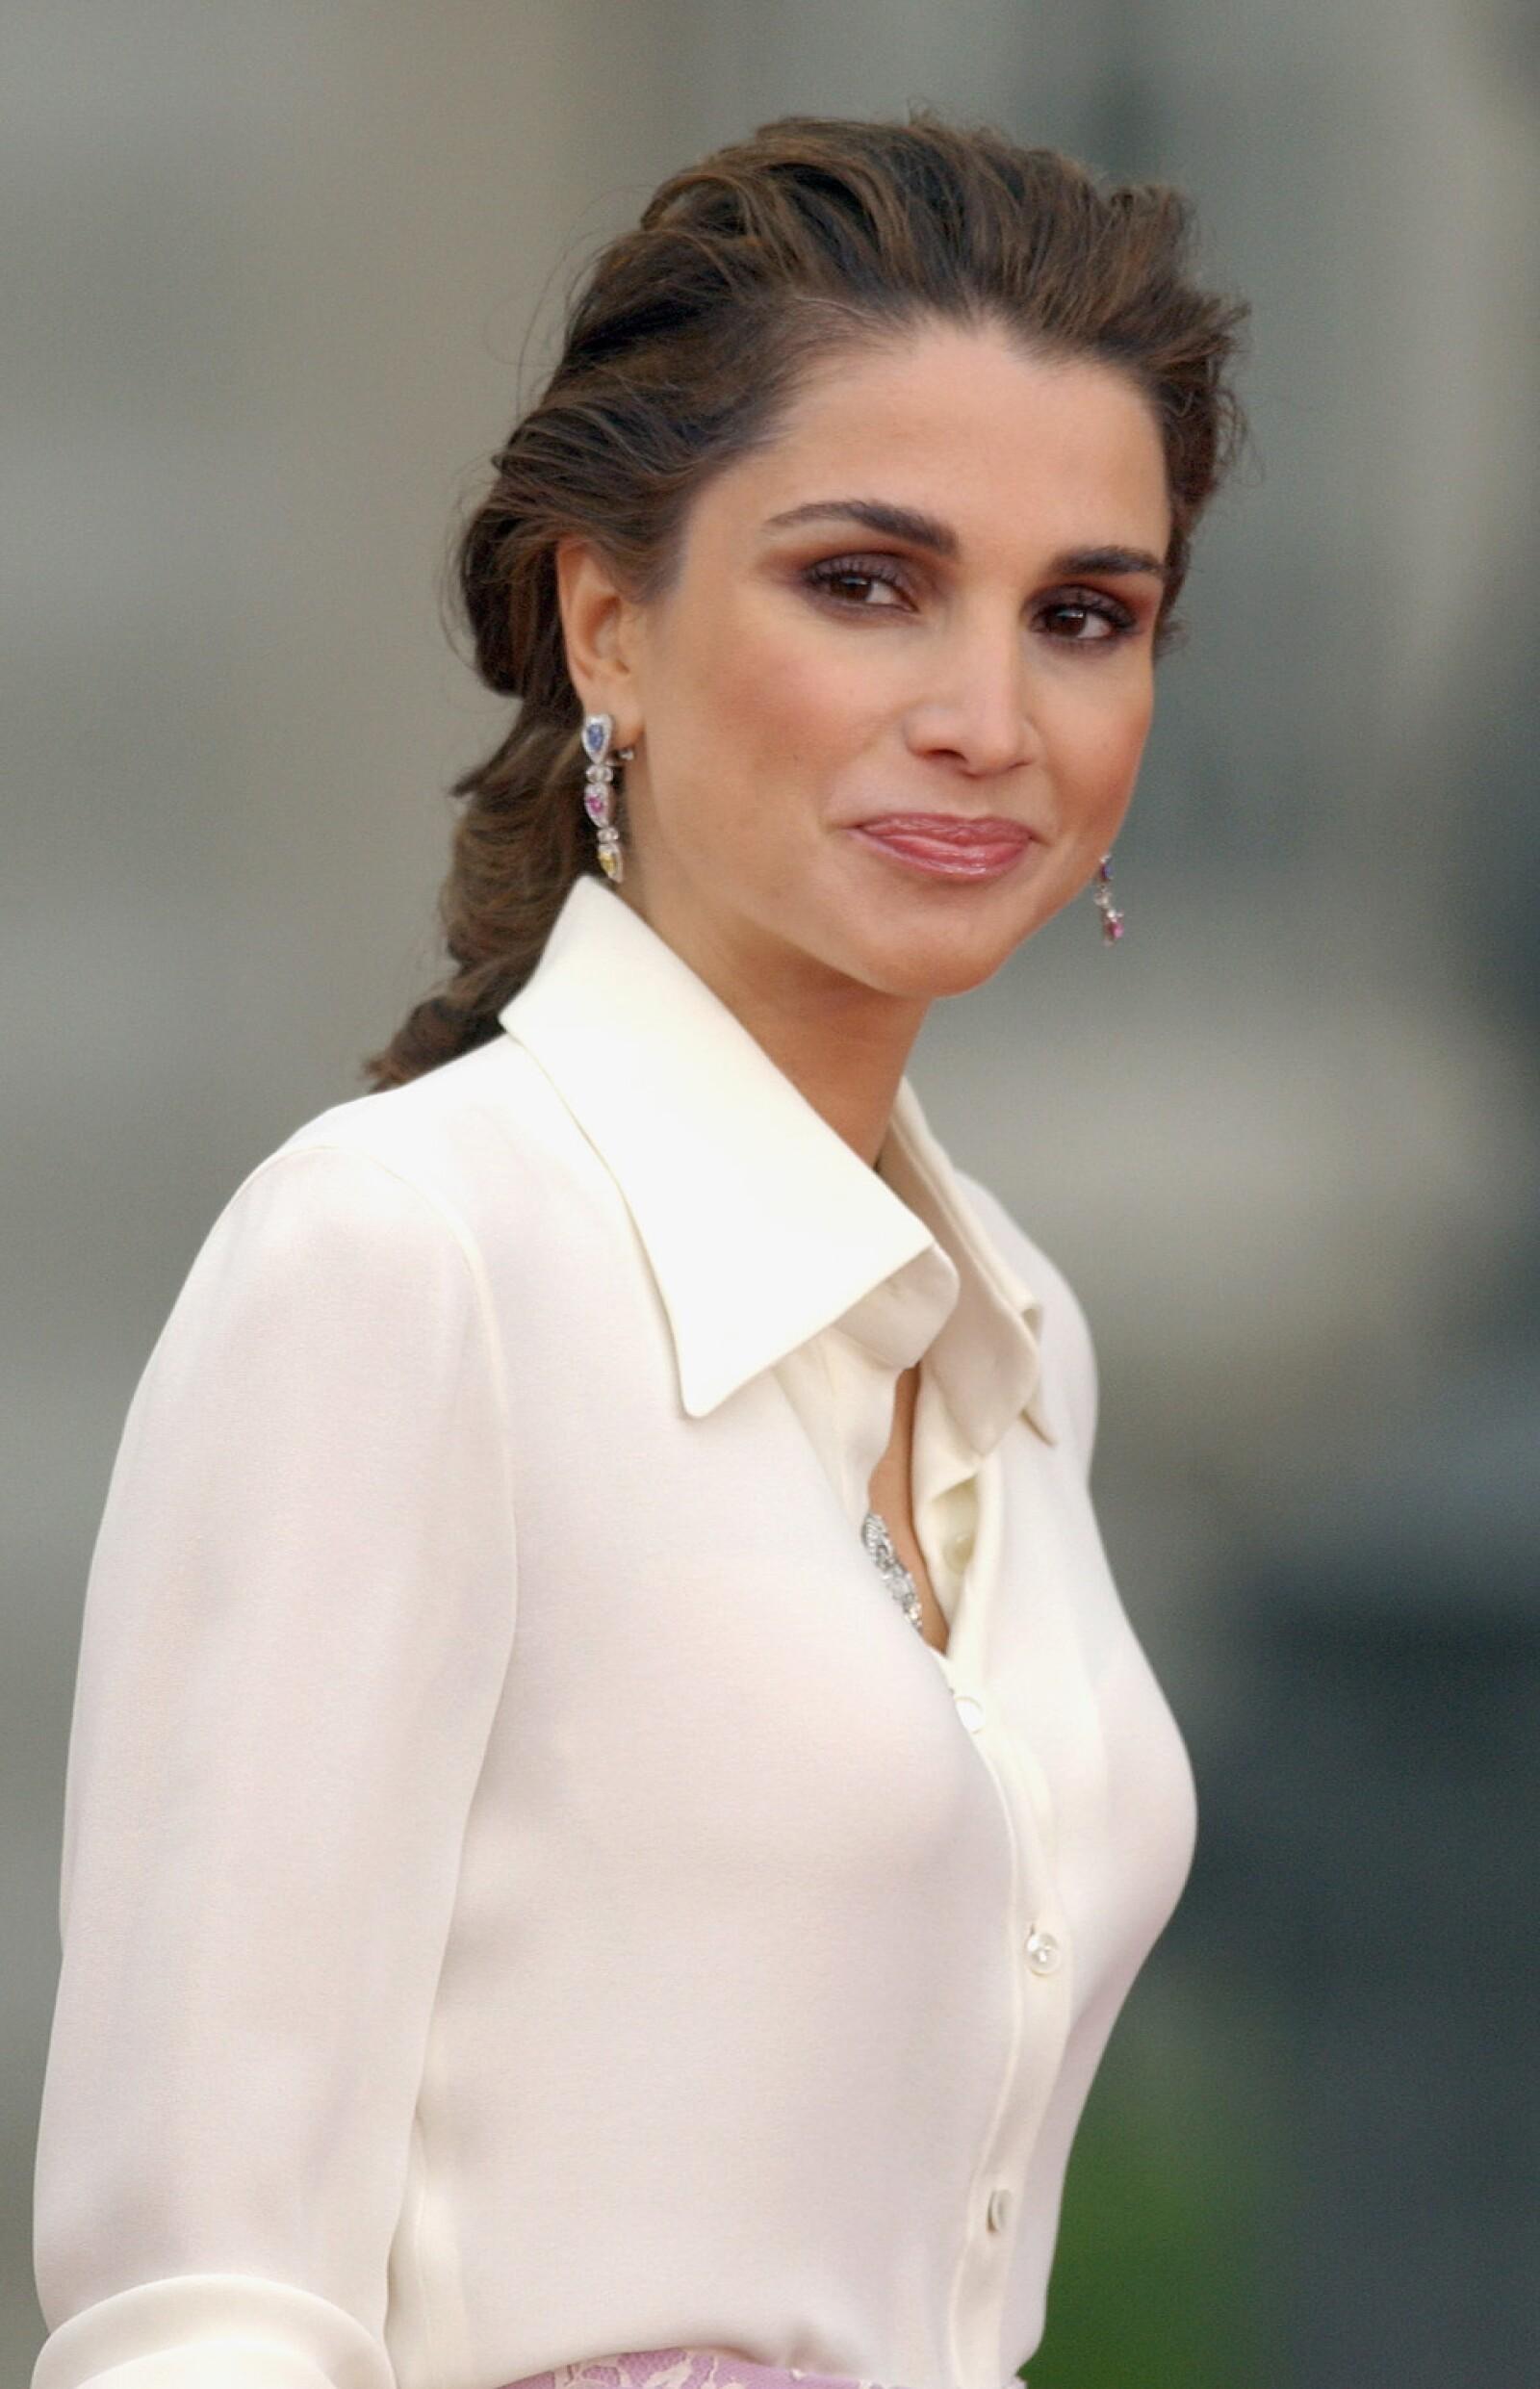 The Wedding Of Crown Prince Felipe & Letizia Ortiz Rocasolano